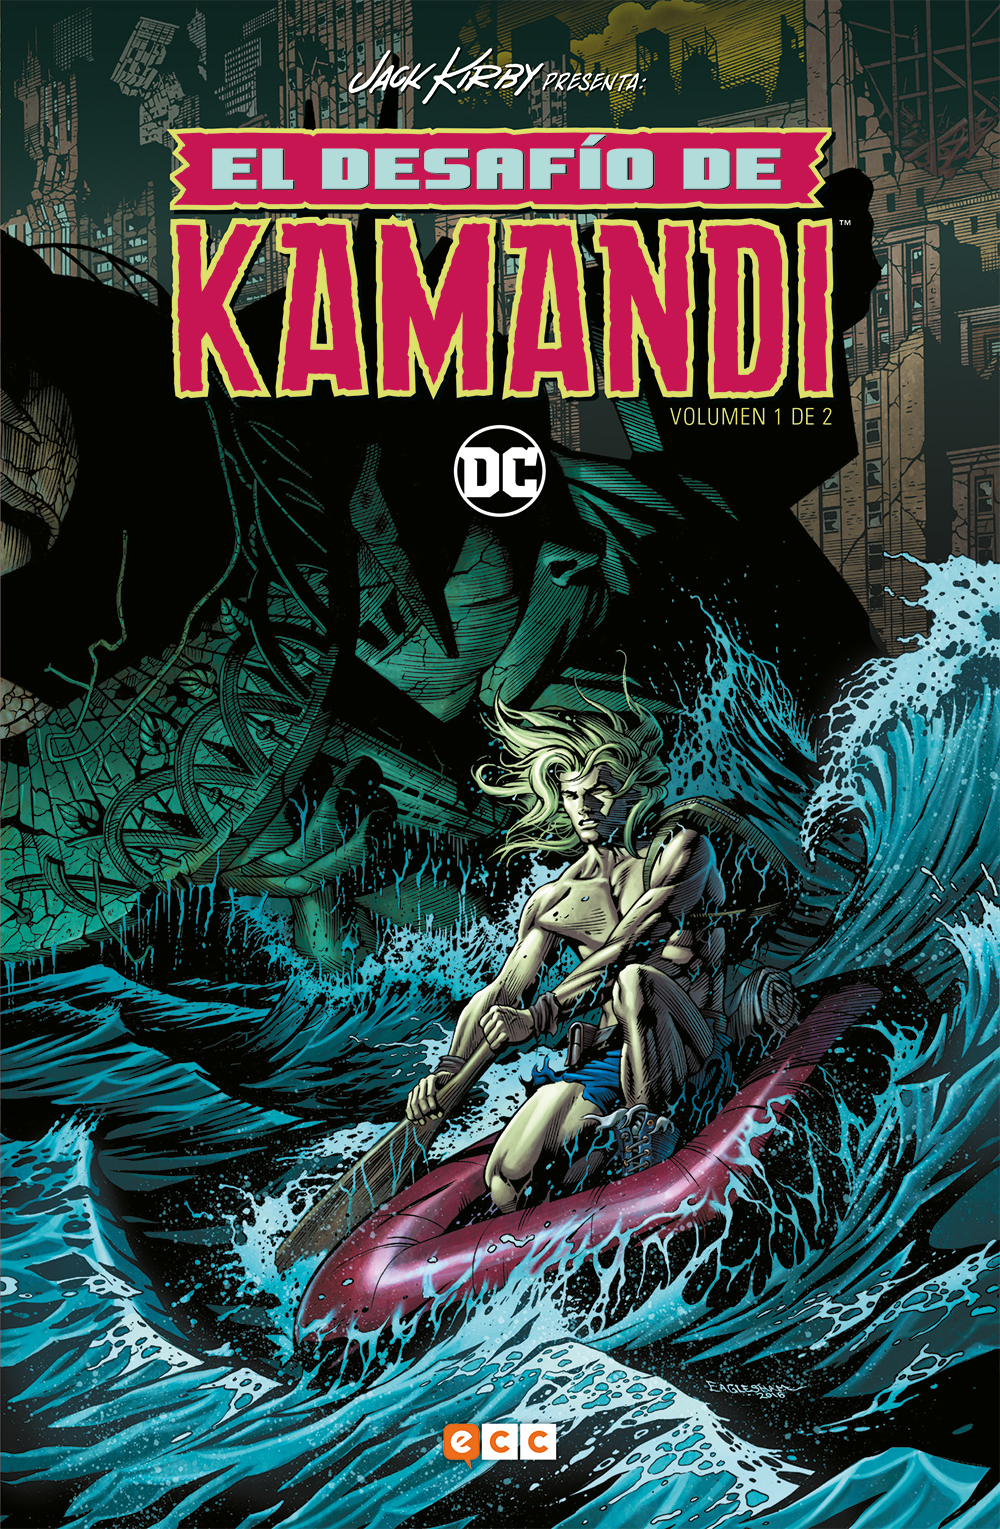 El desafio de Kamandi